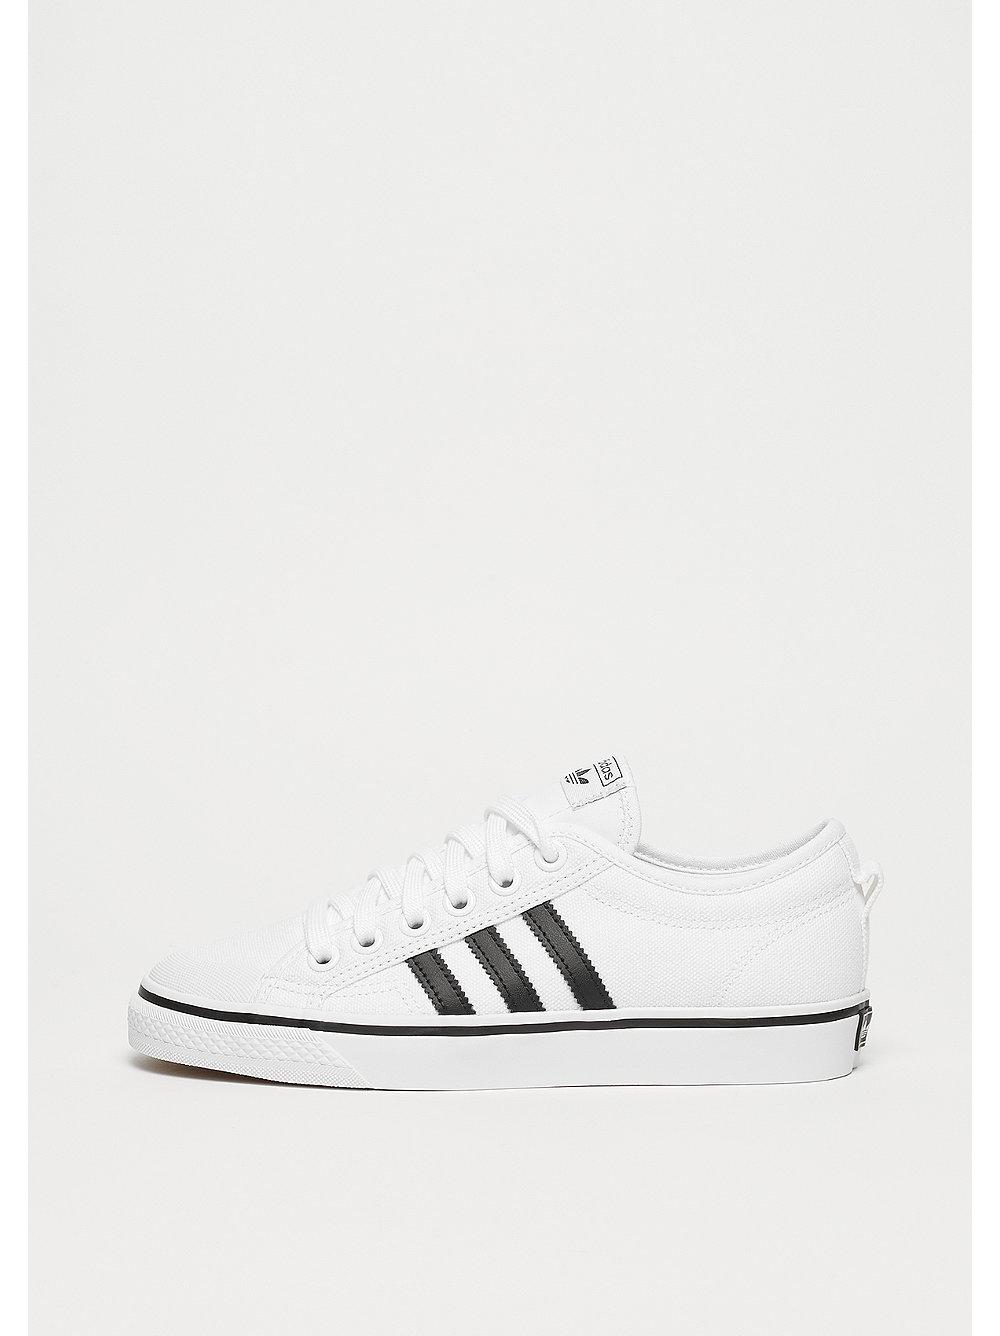 adidas Nizza ftwr white/core black/ftwr white